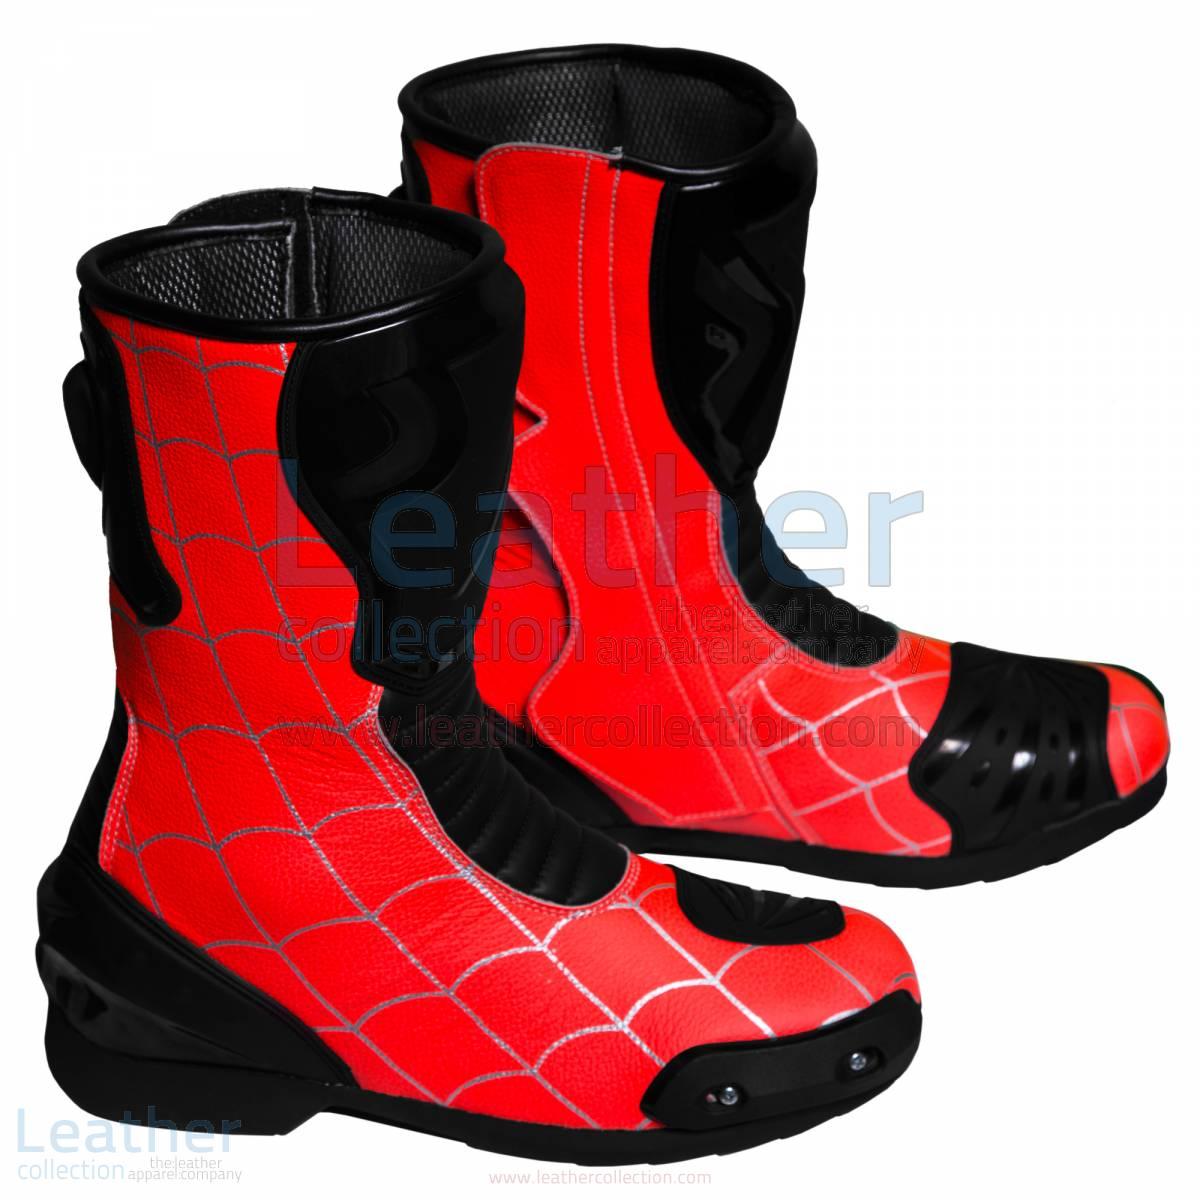 Spiderman Motorbike Racing Boots –  Boot